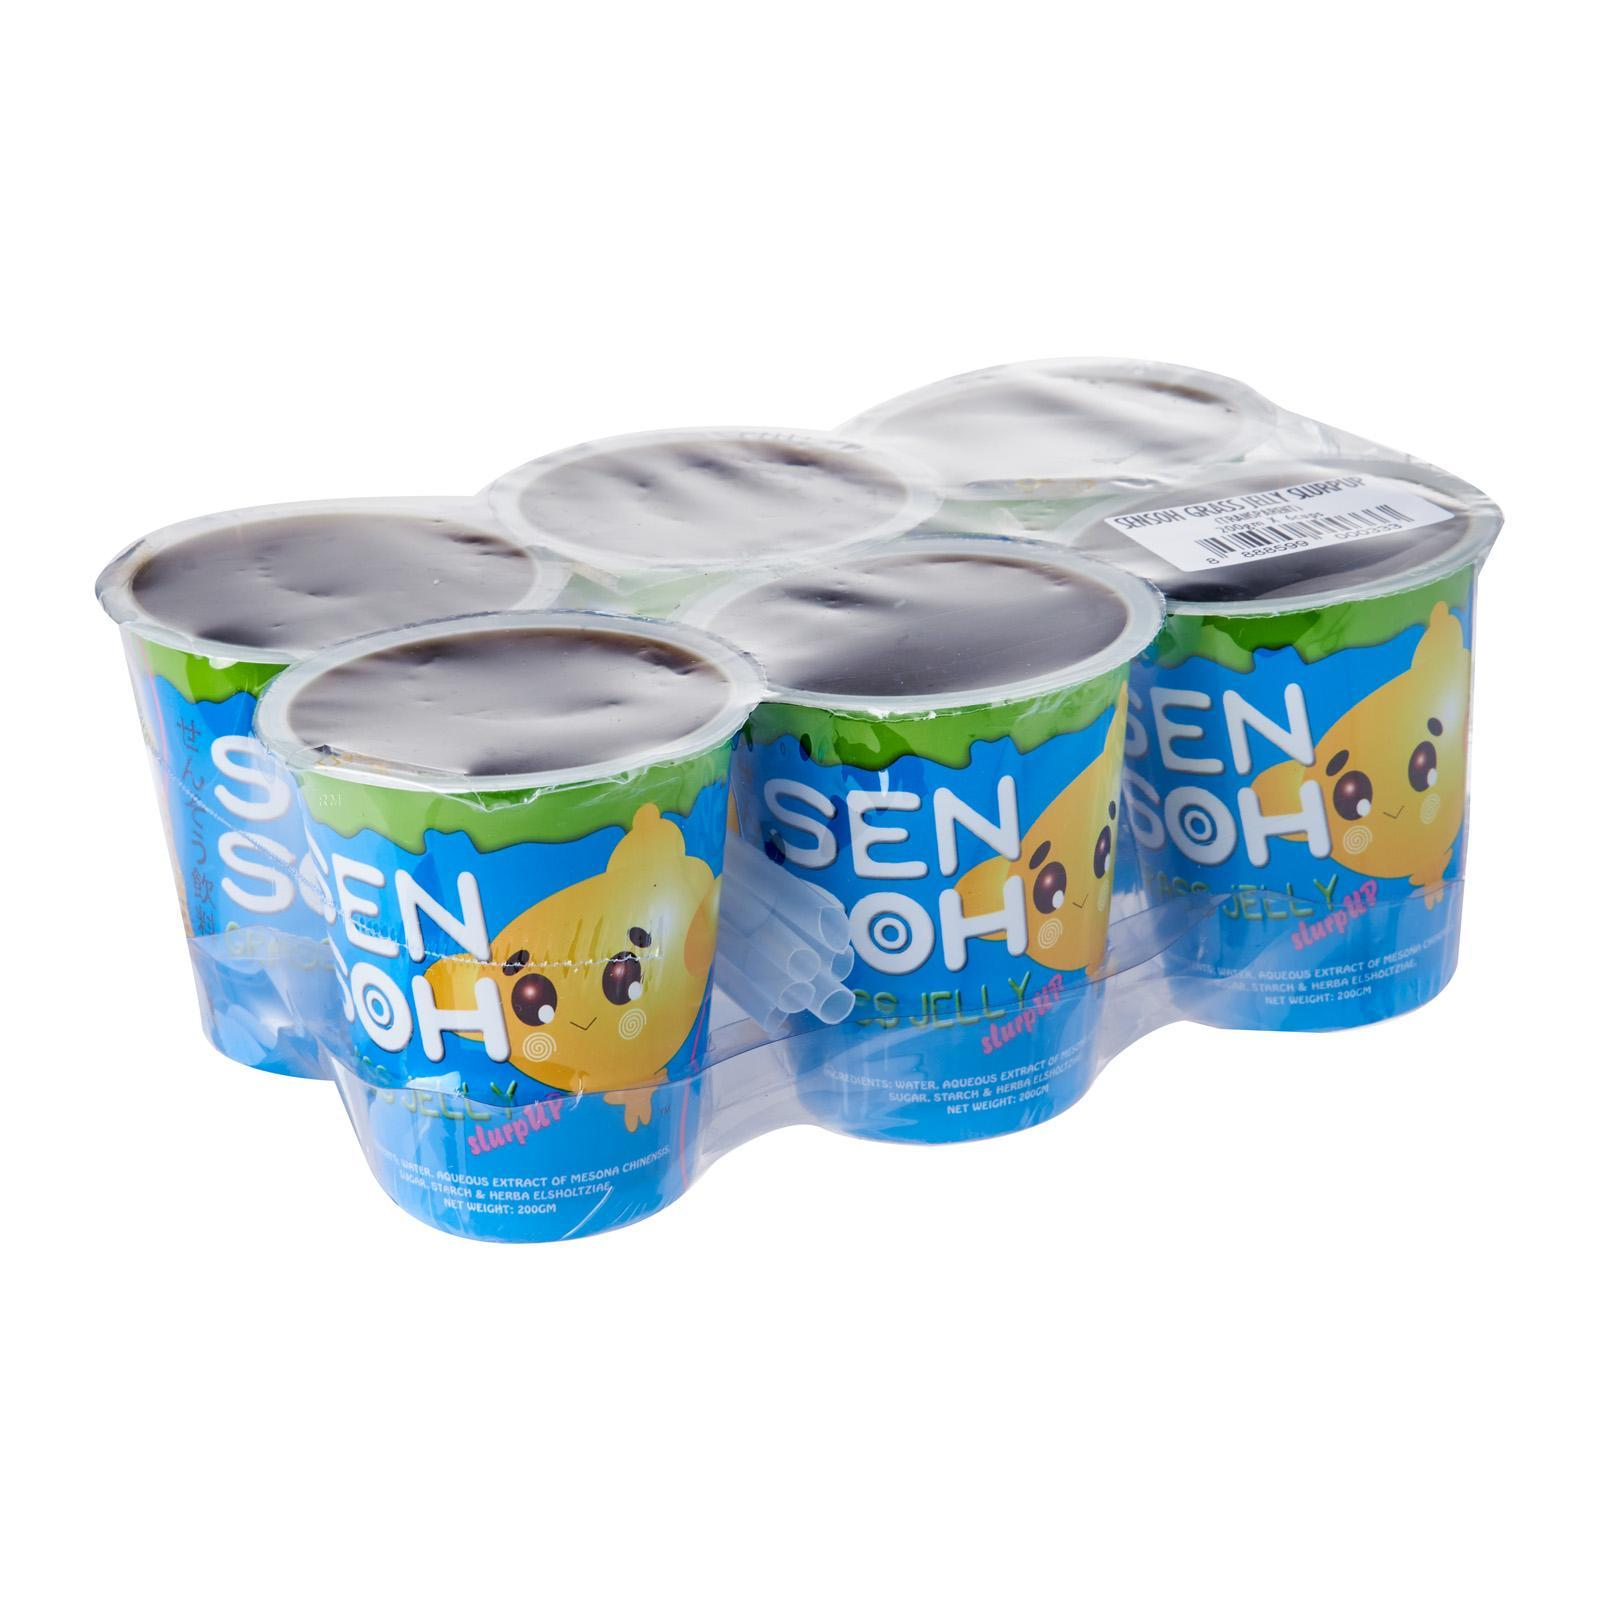 Sensoh Grass Jelly 6s (tray) - Case By Redmart.